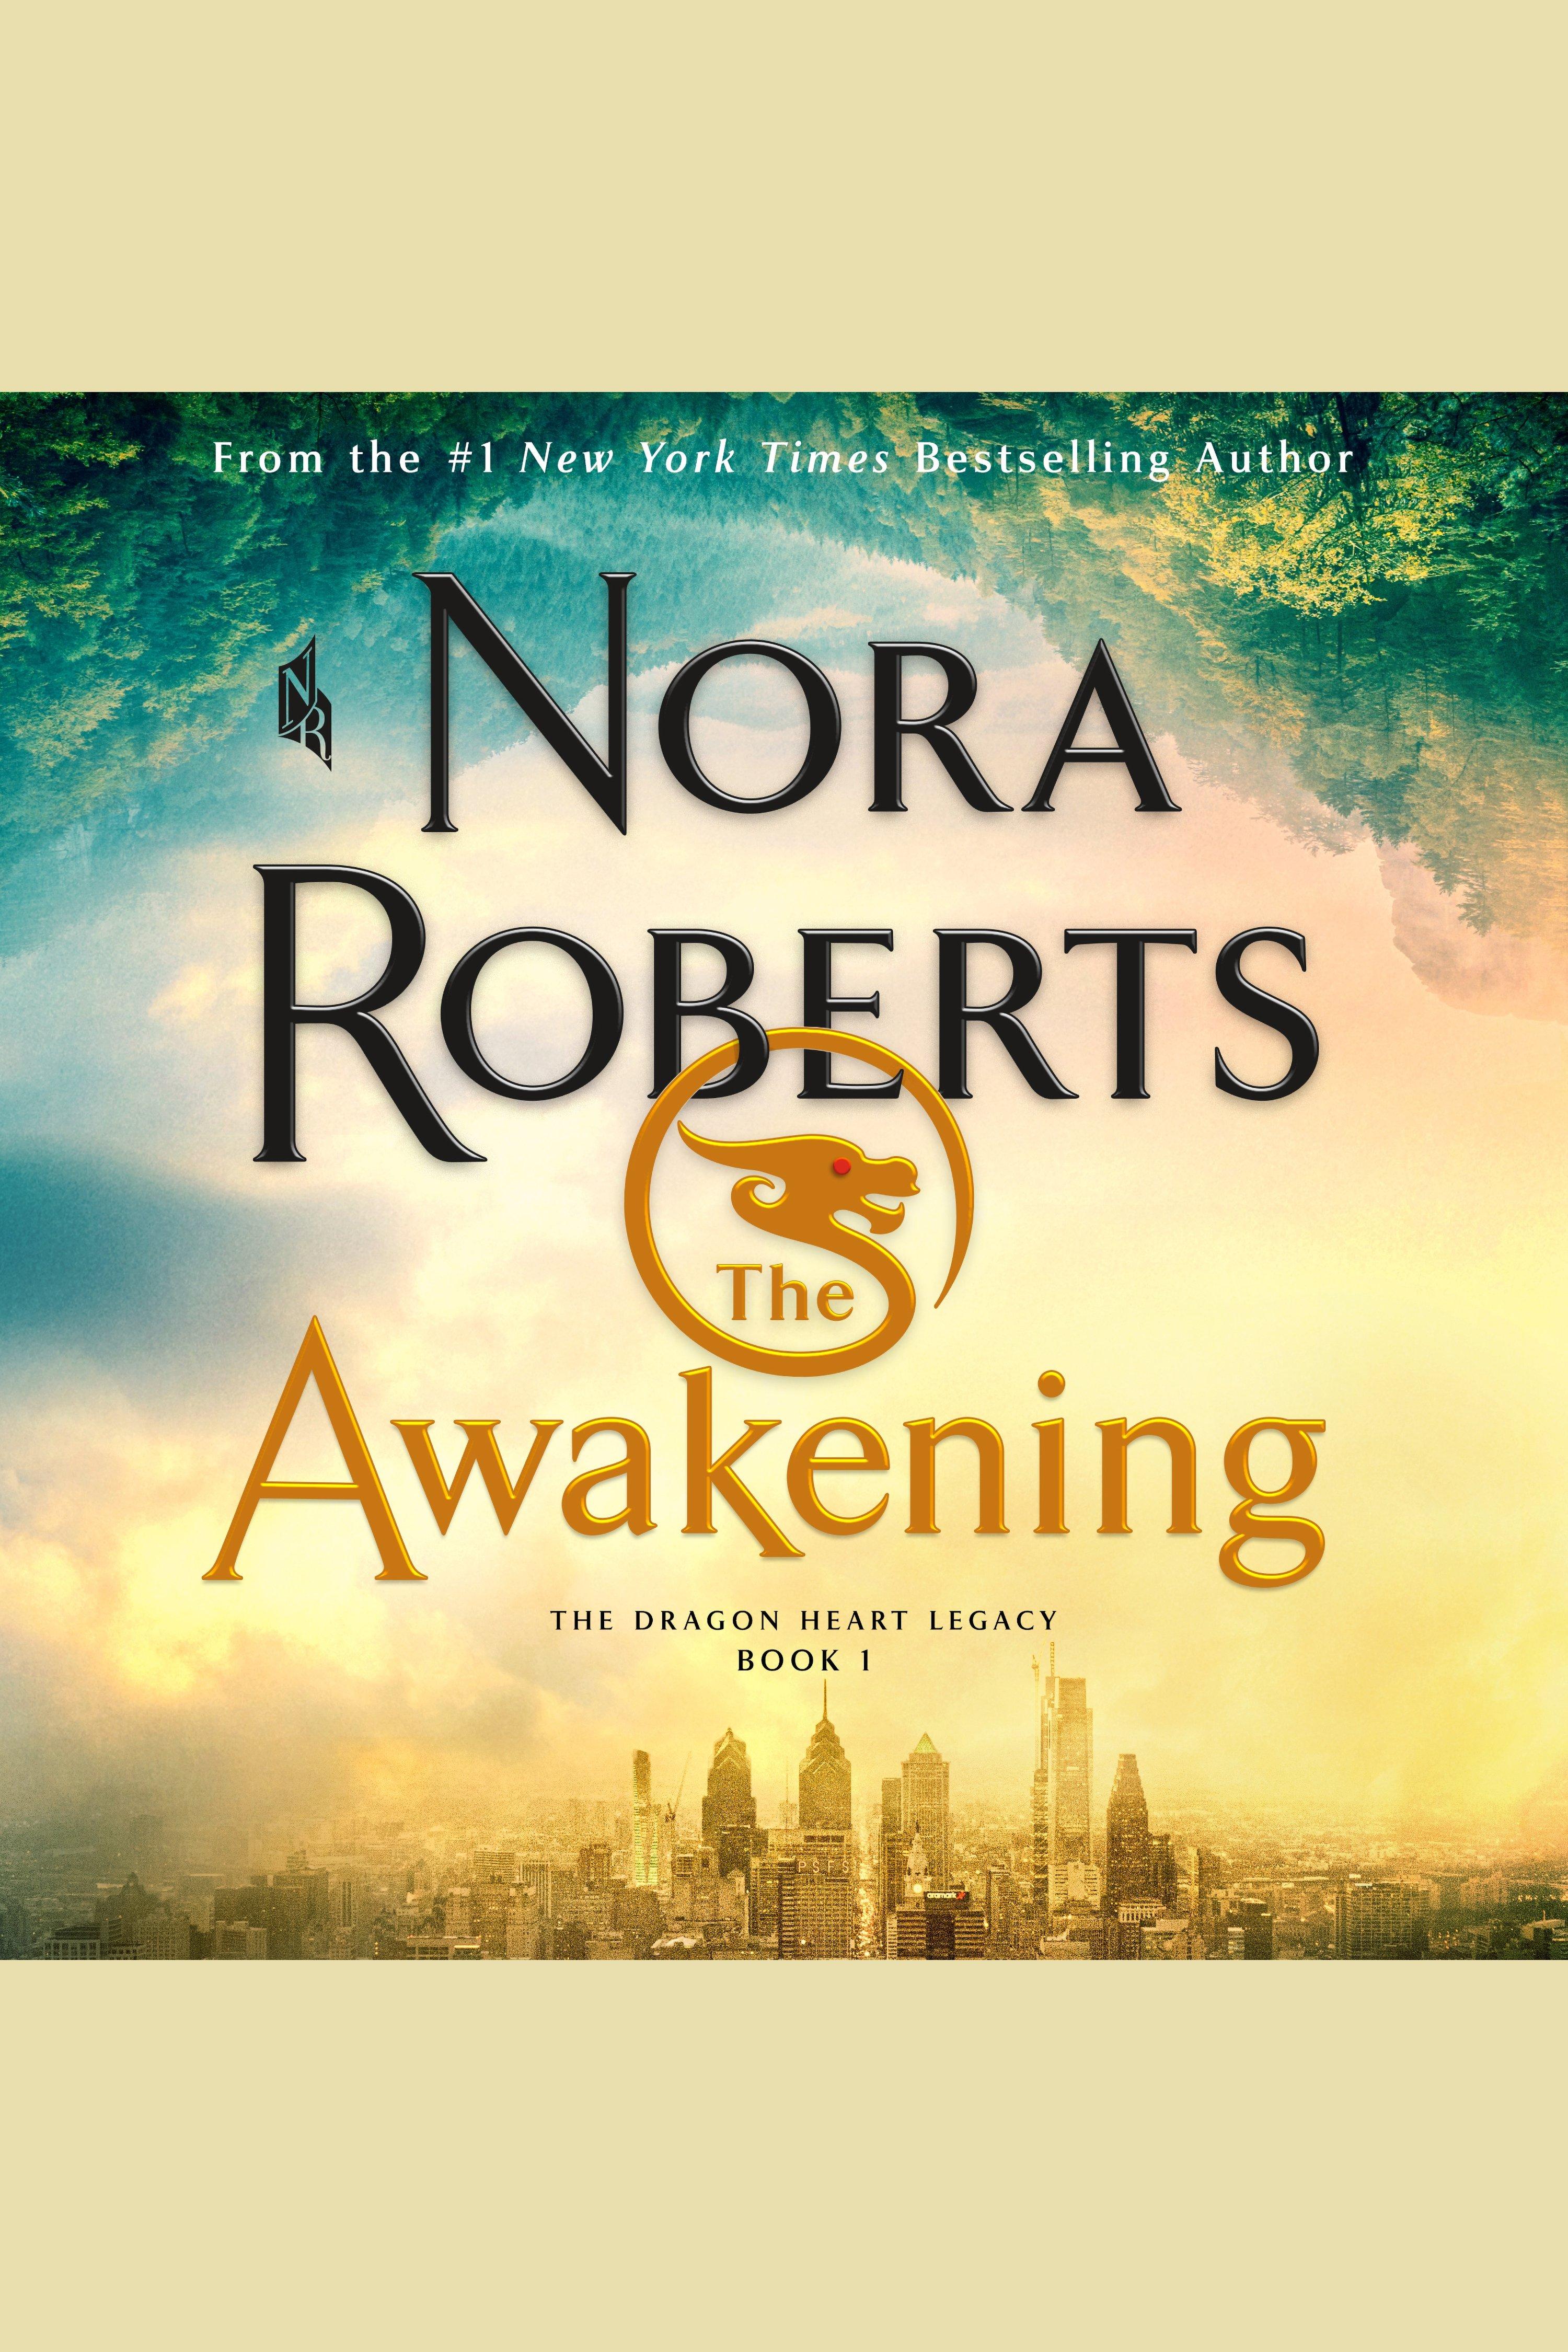 Awakening, The The Dragon Heart Legacy, Book 1